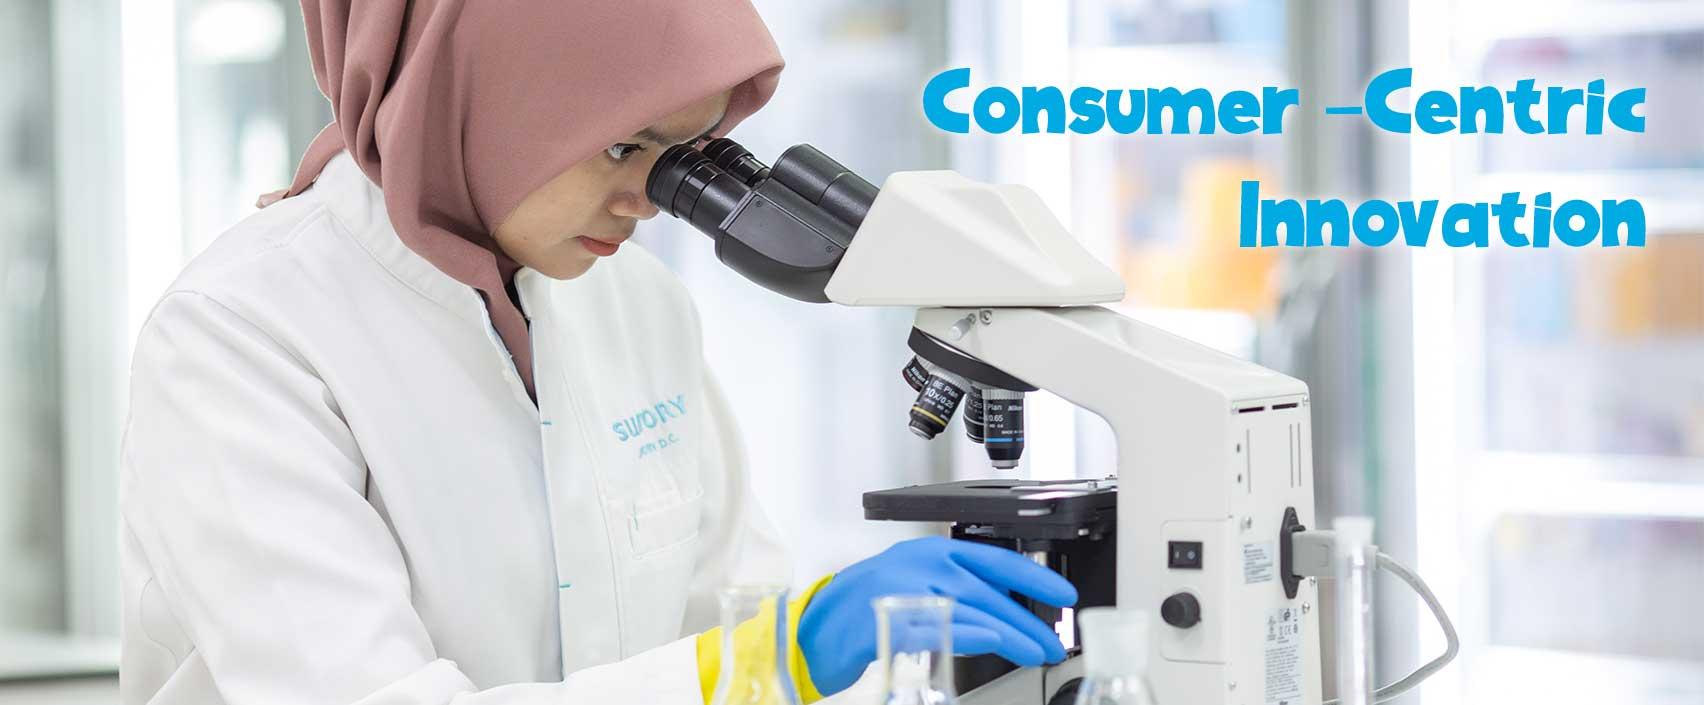 Suntory Garuda selalu mengejar inovasi produk minuman untuk kesehatan dan kepuasan pelanggan